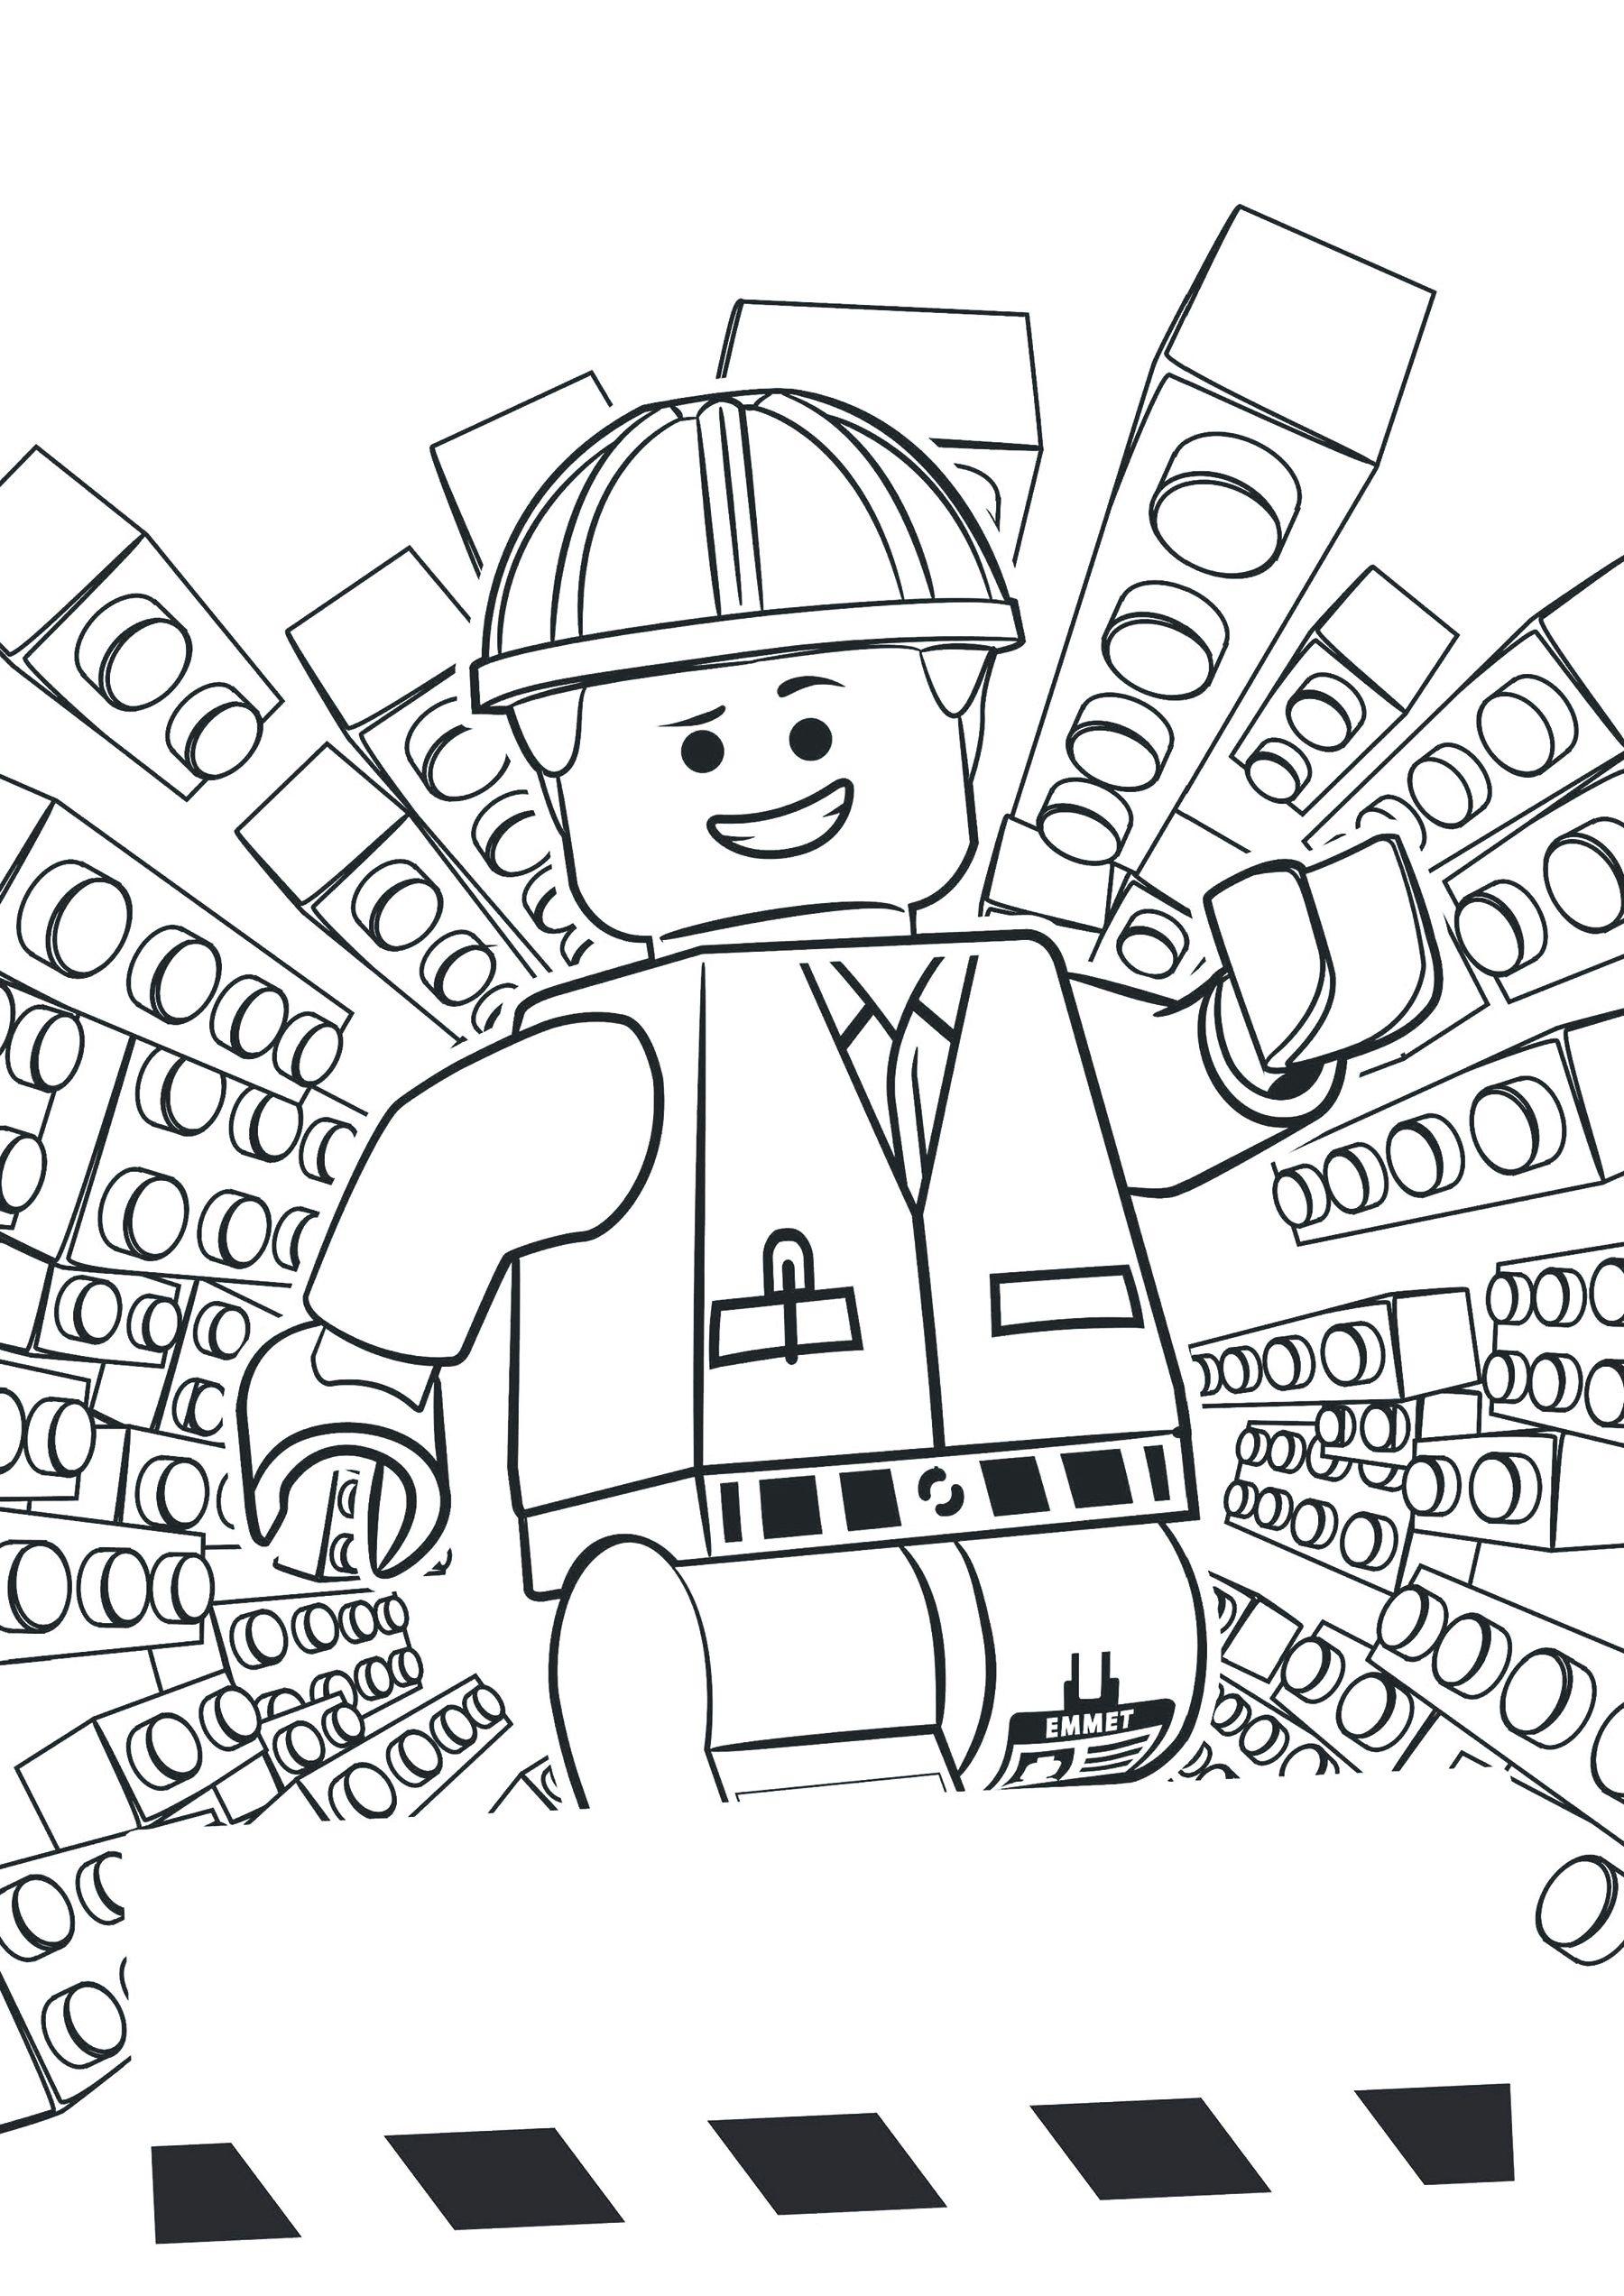 Pin Ot Polzovatelya Alina Tgfd Na Doske Idei 6 Lego Raskraski